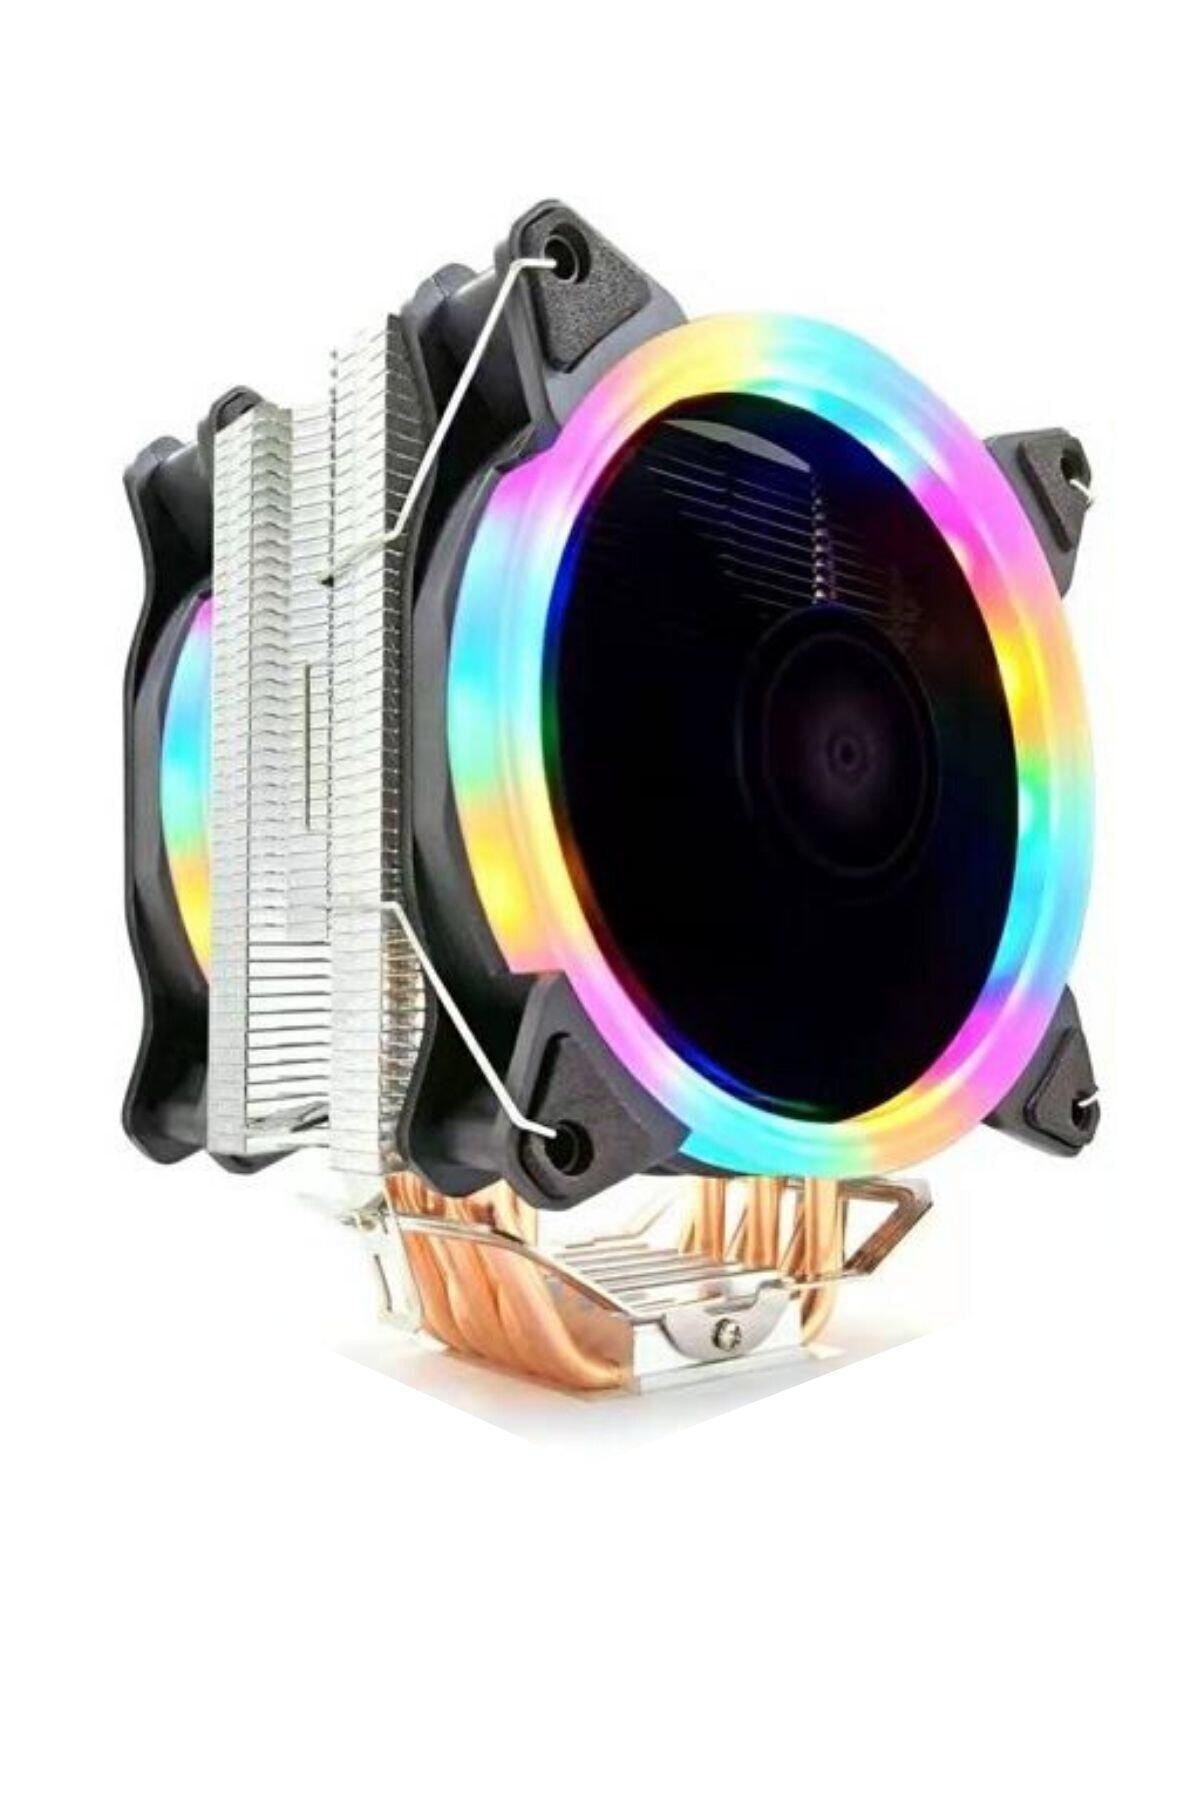 Snowman T6 Ultra Soğutma 6 Bakır Kanallı Rainbow Cooler Fan 1